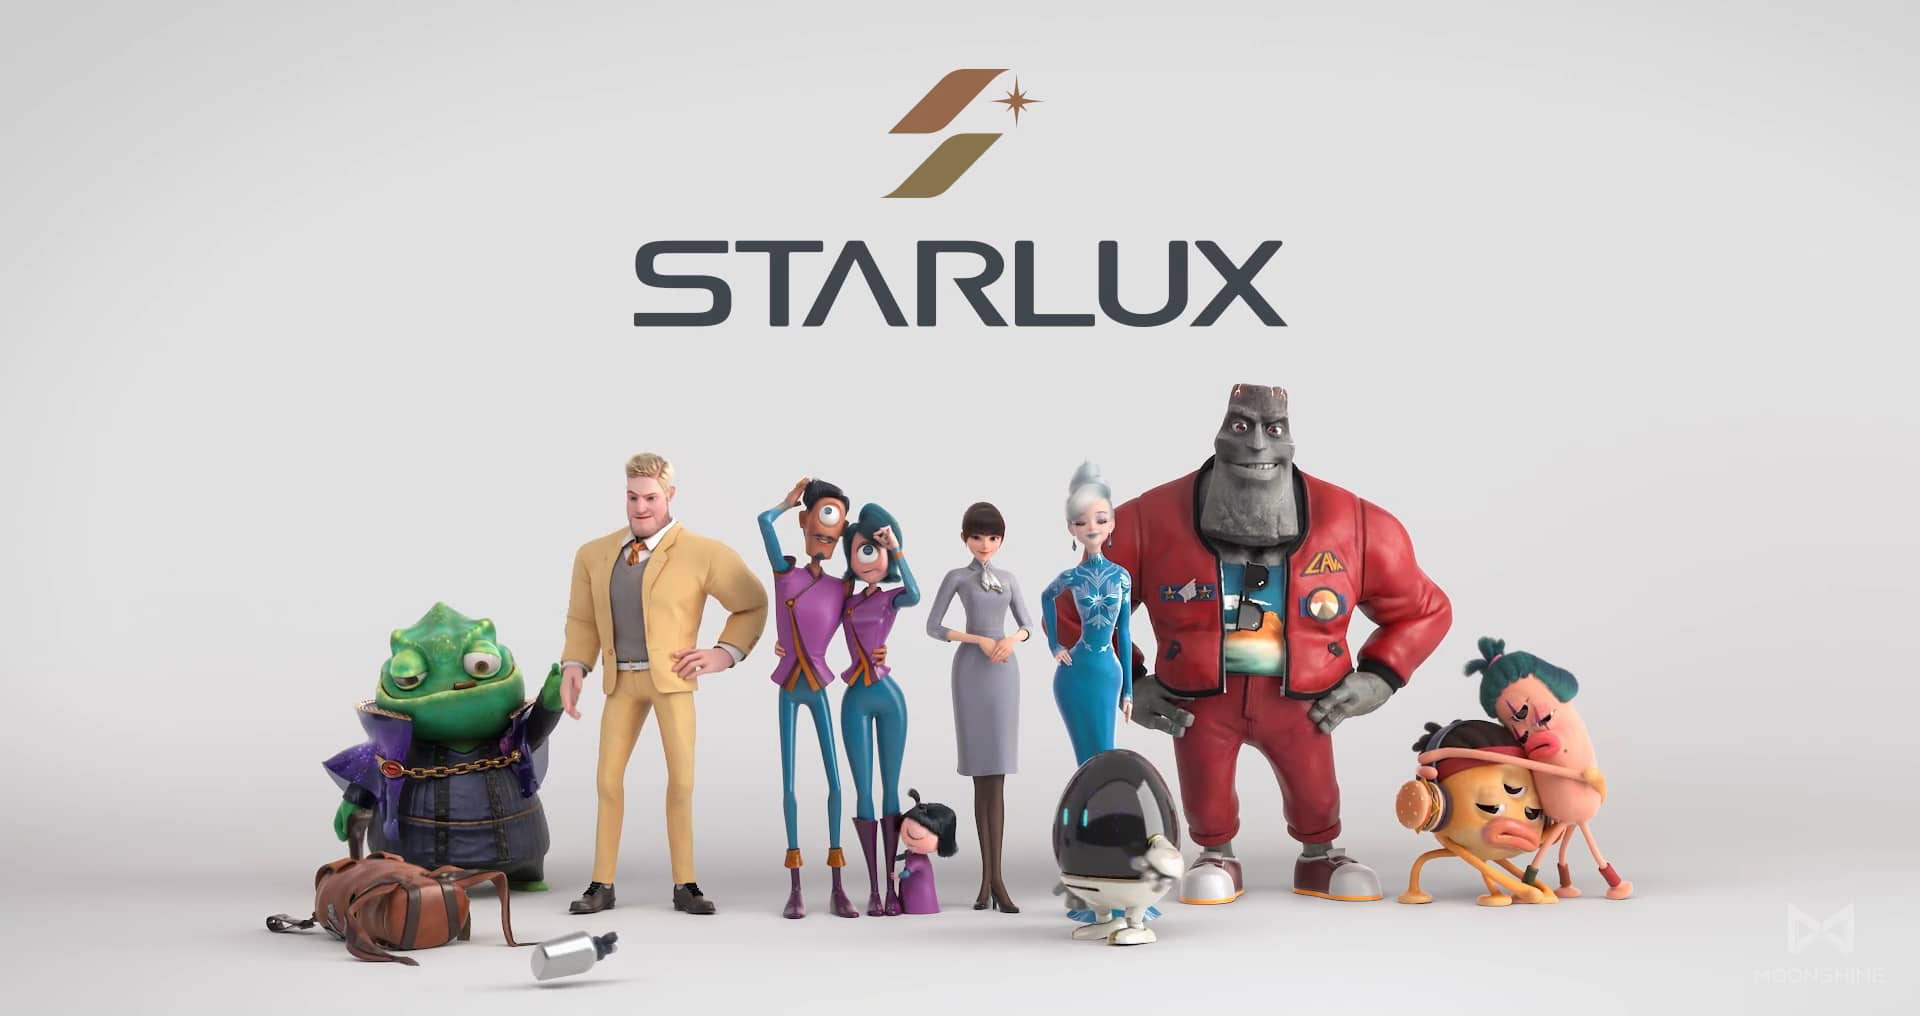 Starlux video.